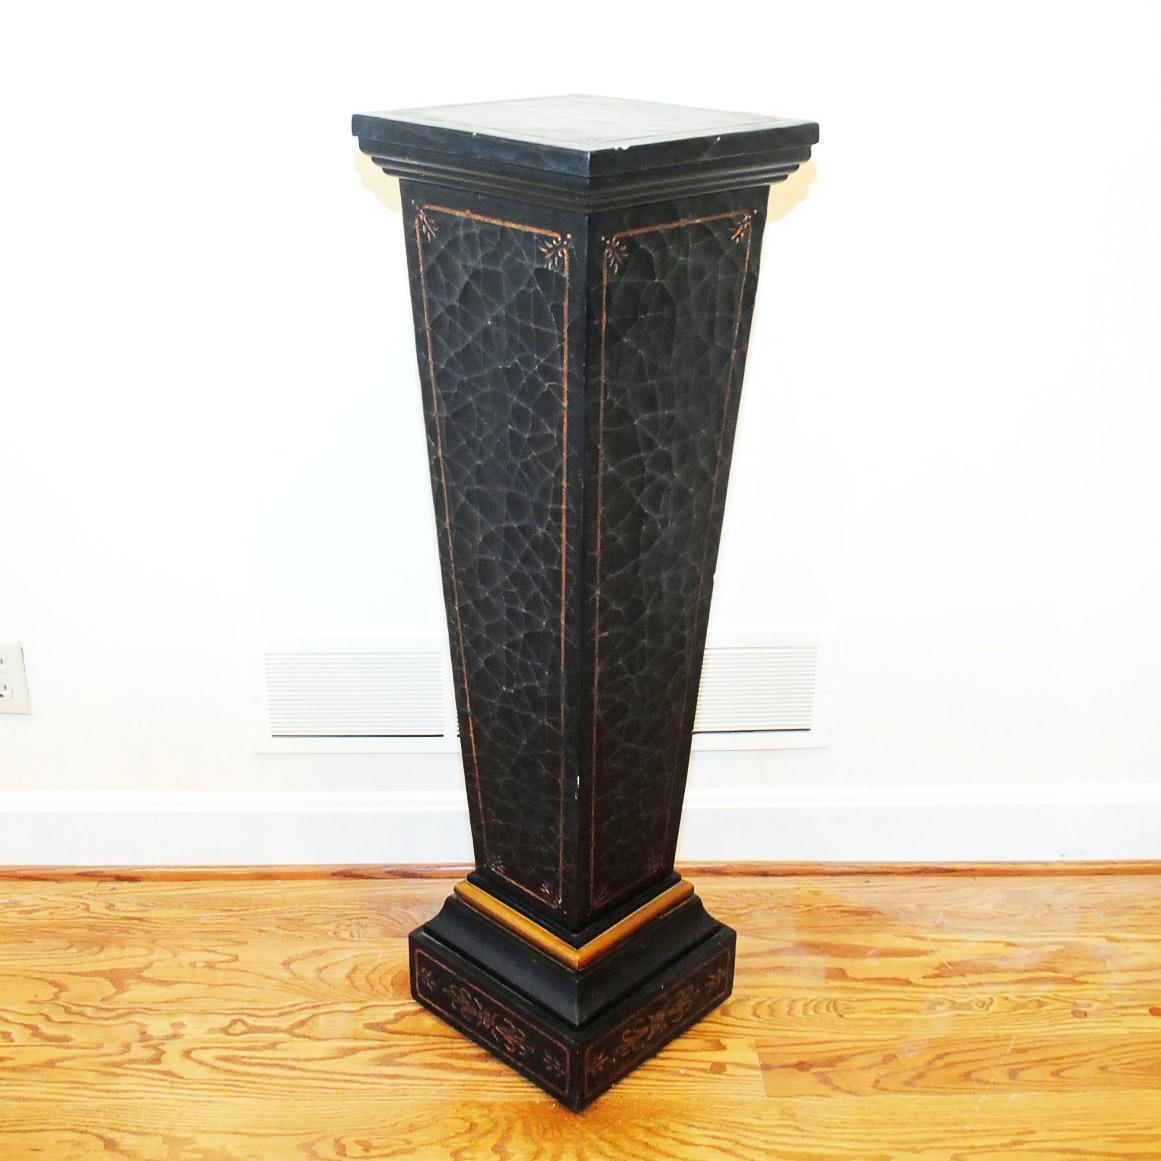 Ornate Decorative Pedestal Plant Stand